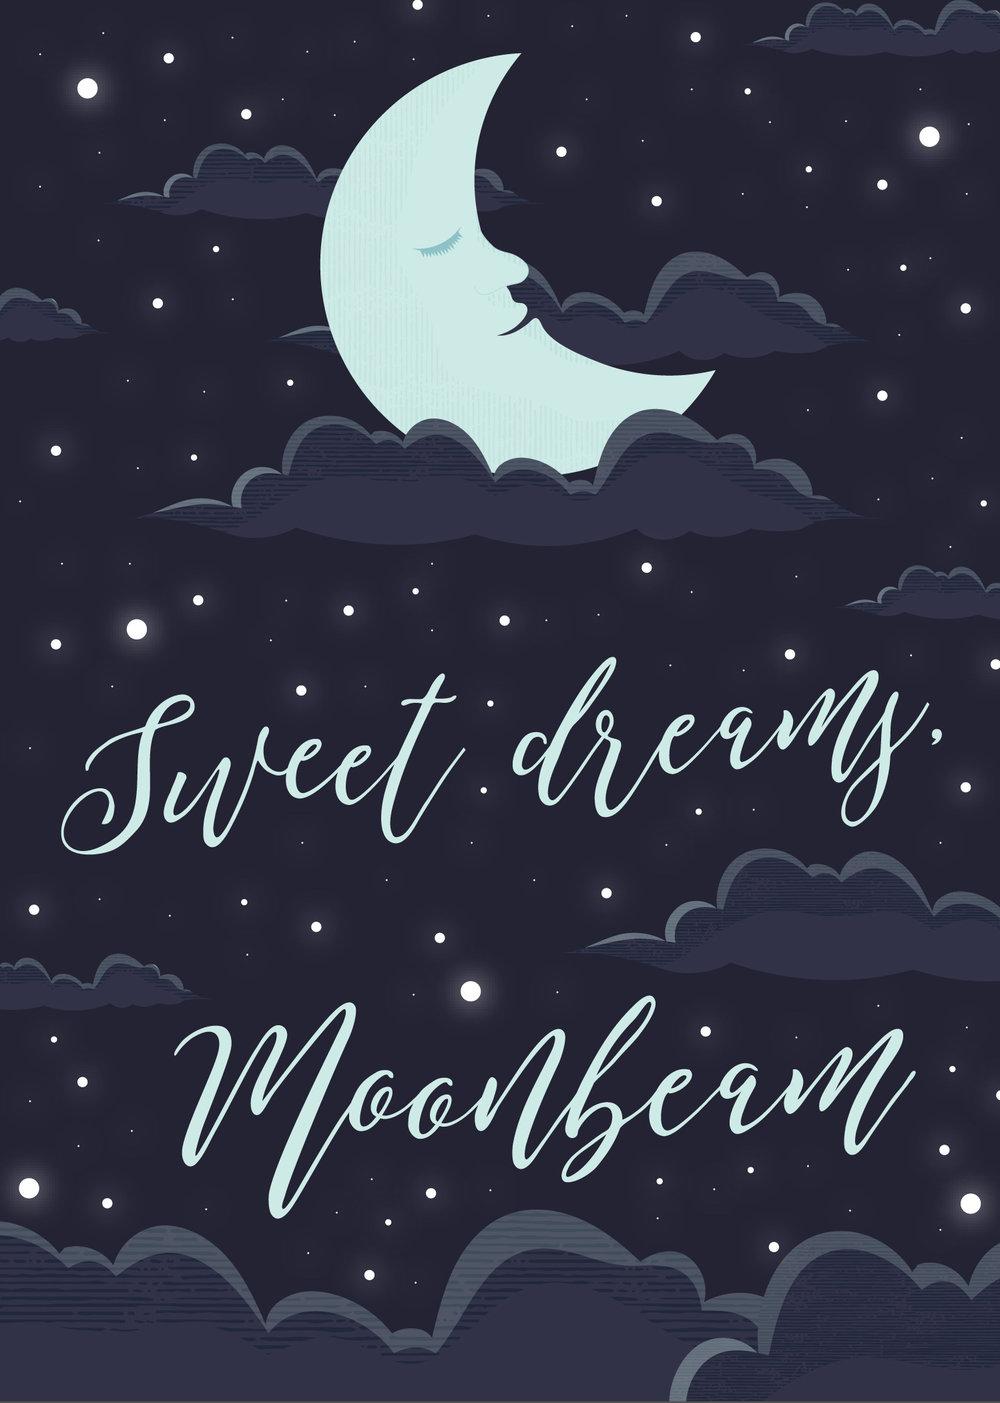 SweetDreams-01.jpg